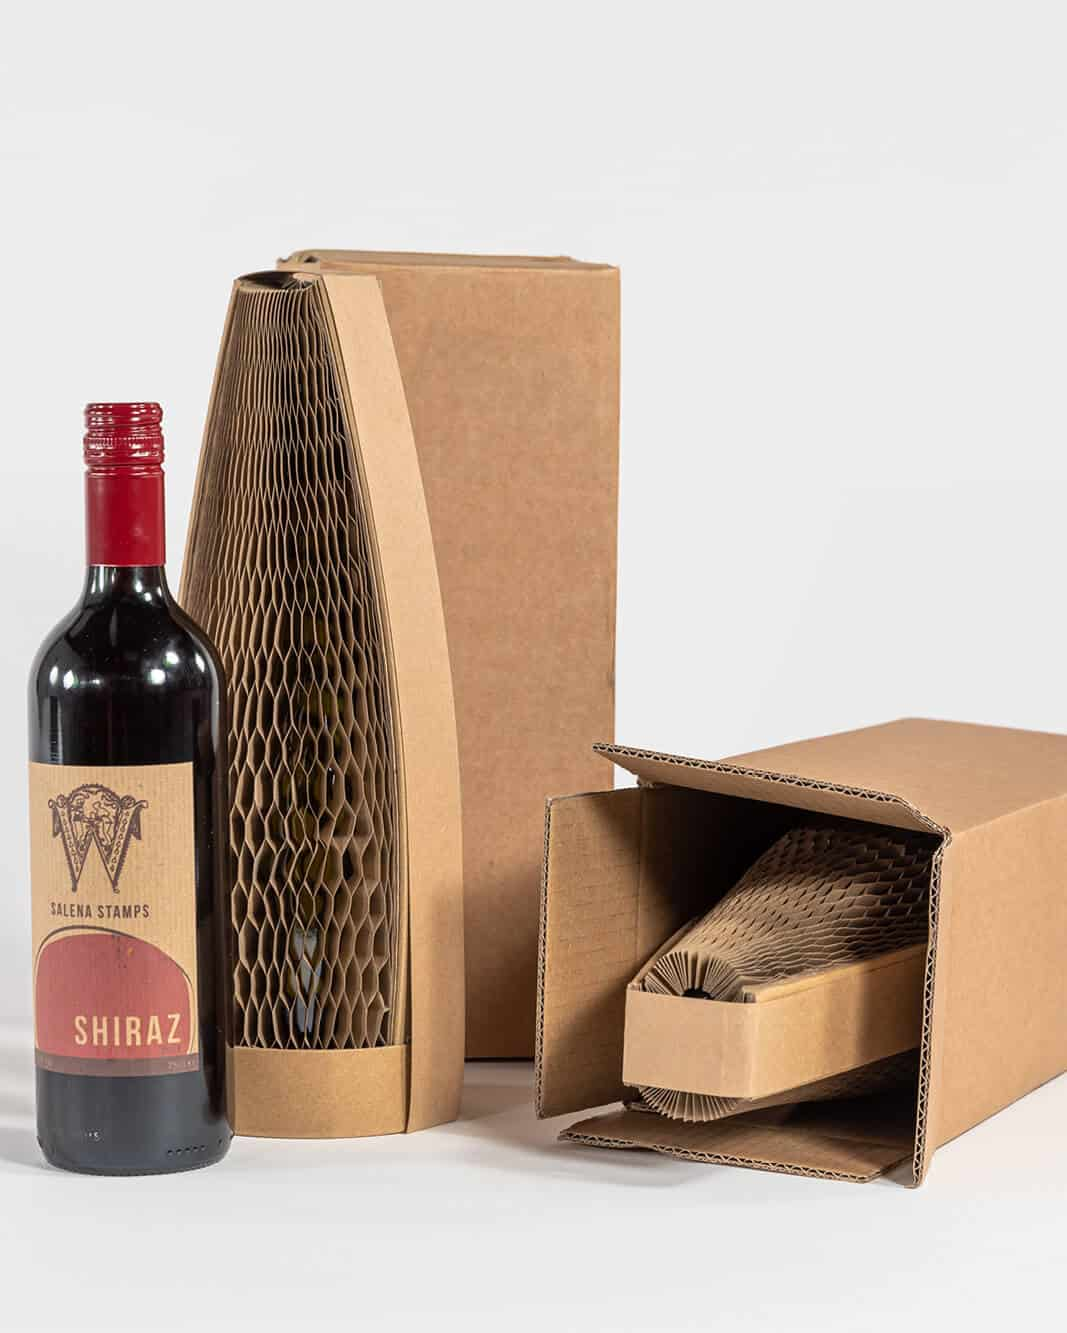 Slender bottle packaging with box